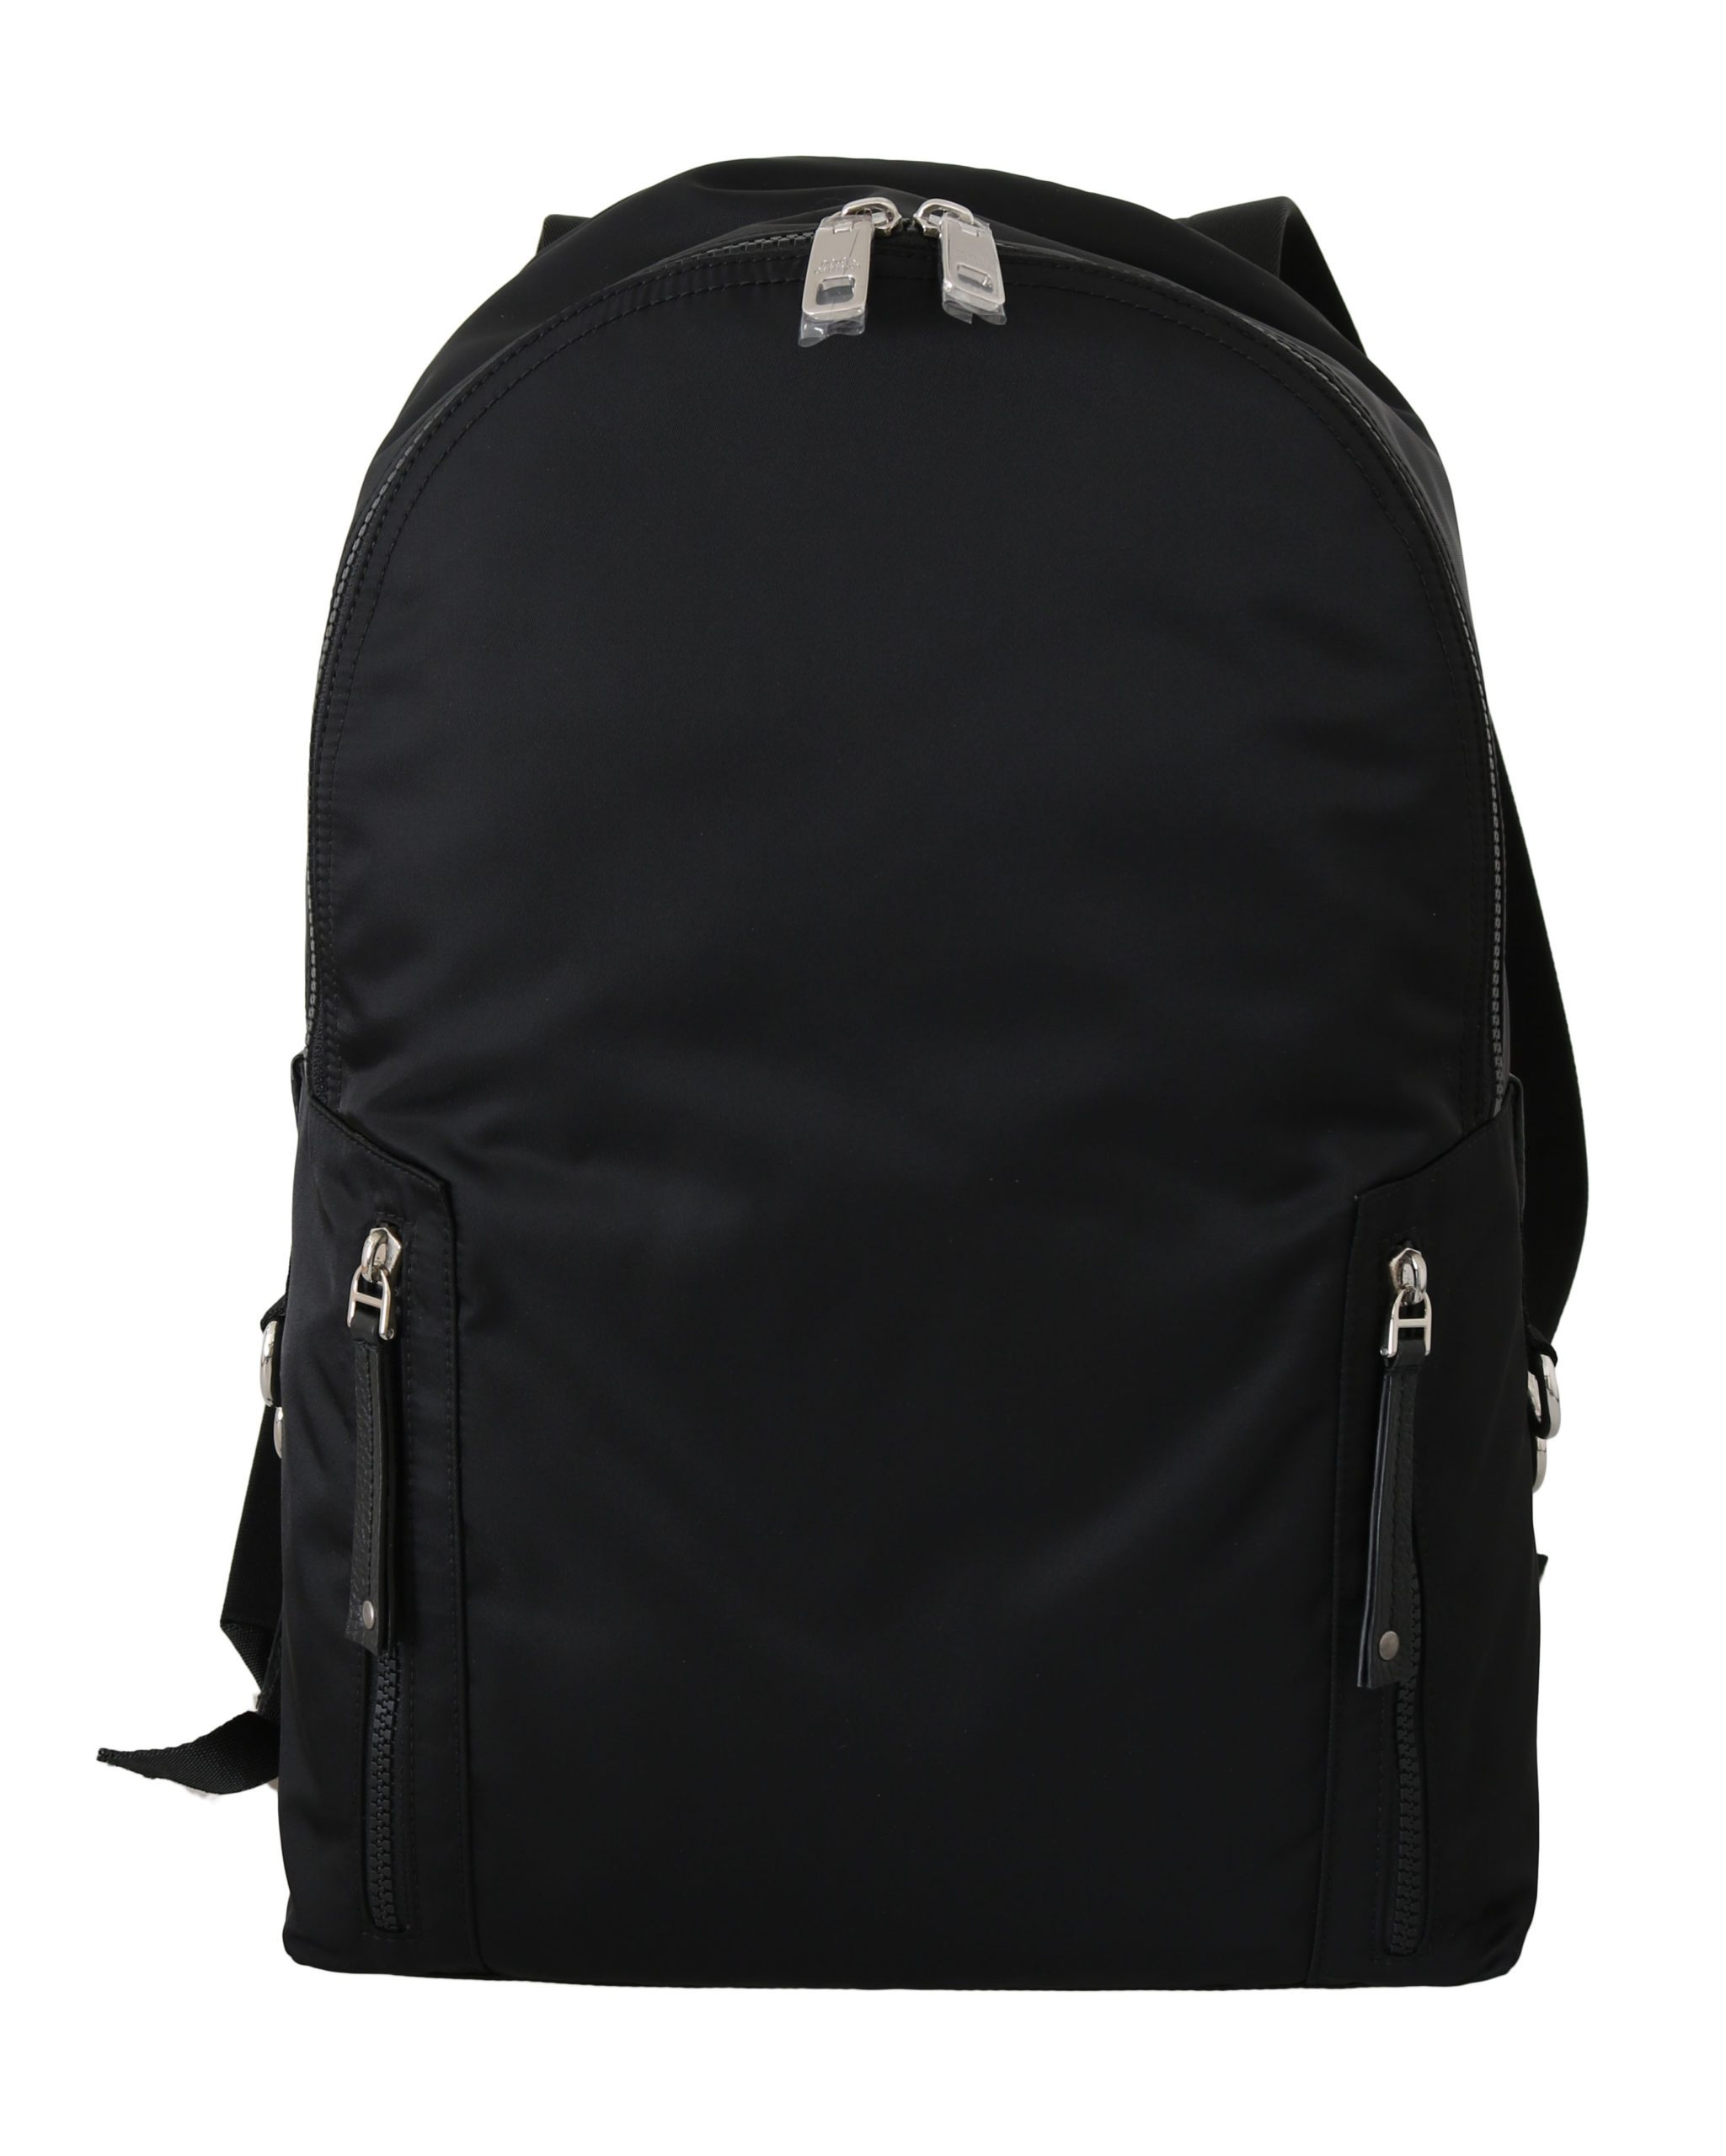 Dolce & Gabbana Men's Nylon Leather Casual School Backpack Black VA8828